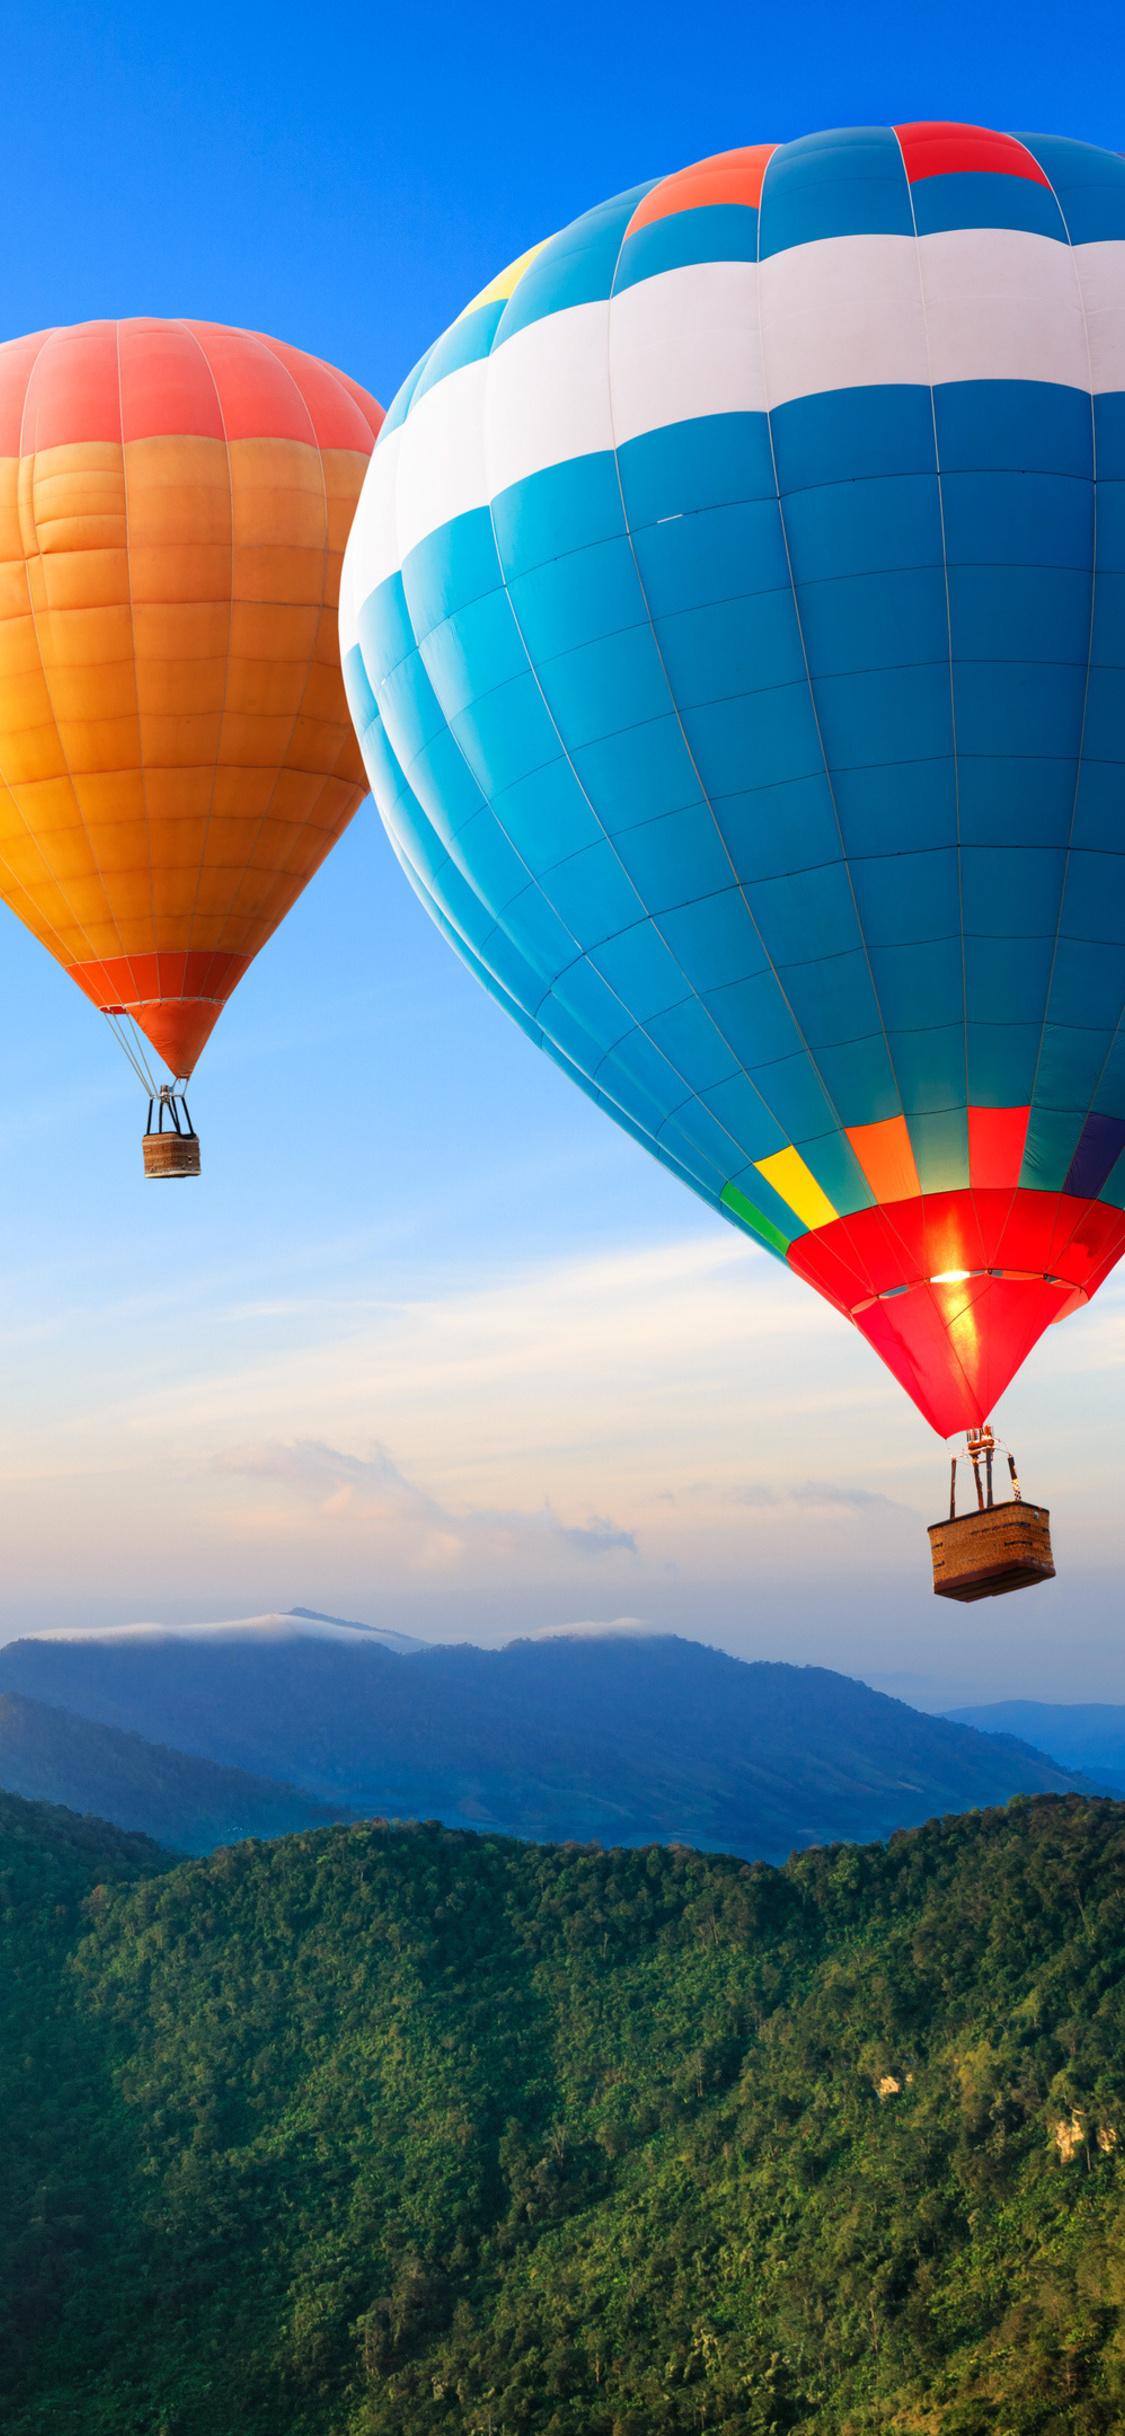 1125x2436 Hot Air Balloon 4k Iphone XS,Iphone 10,Iphone X ...